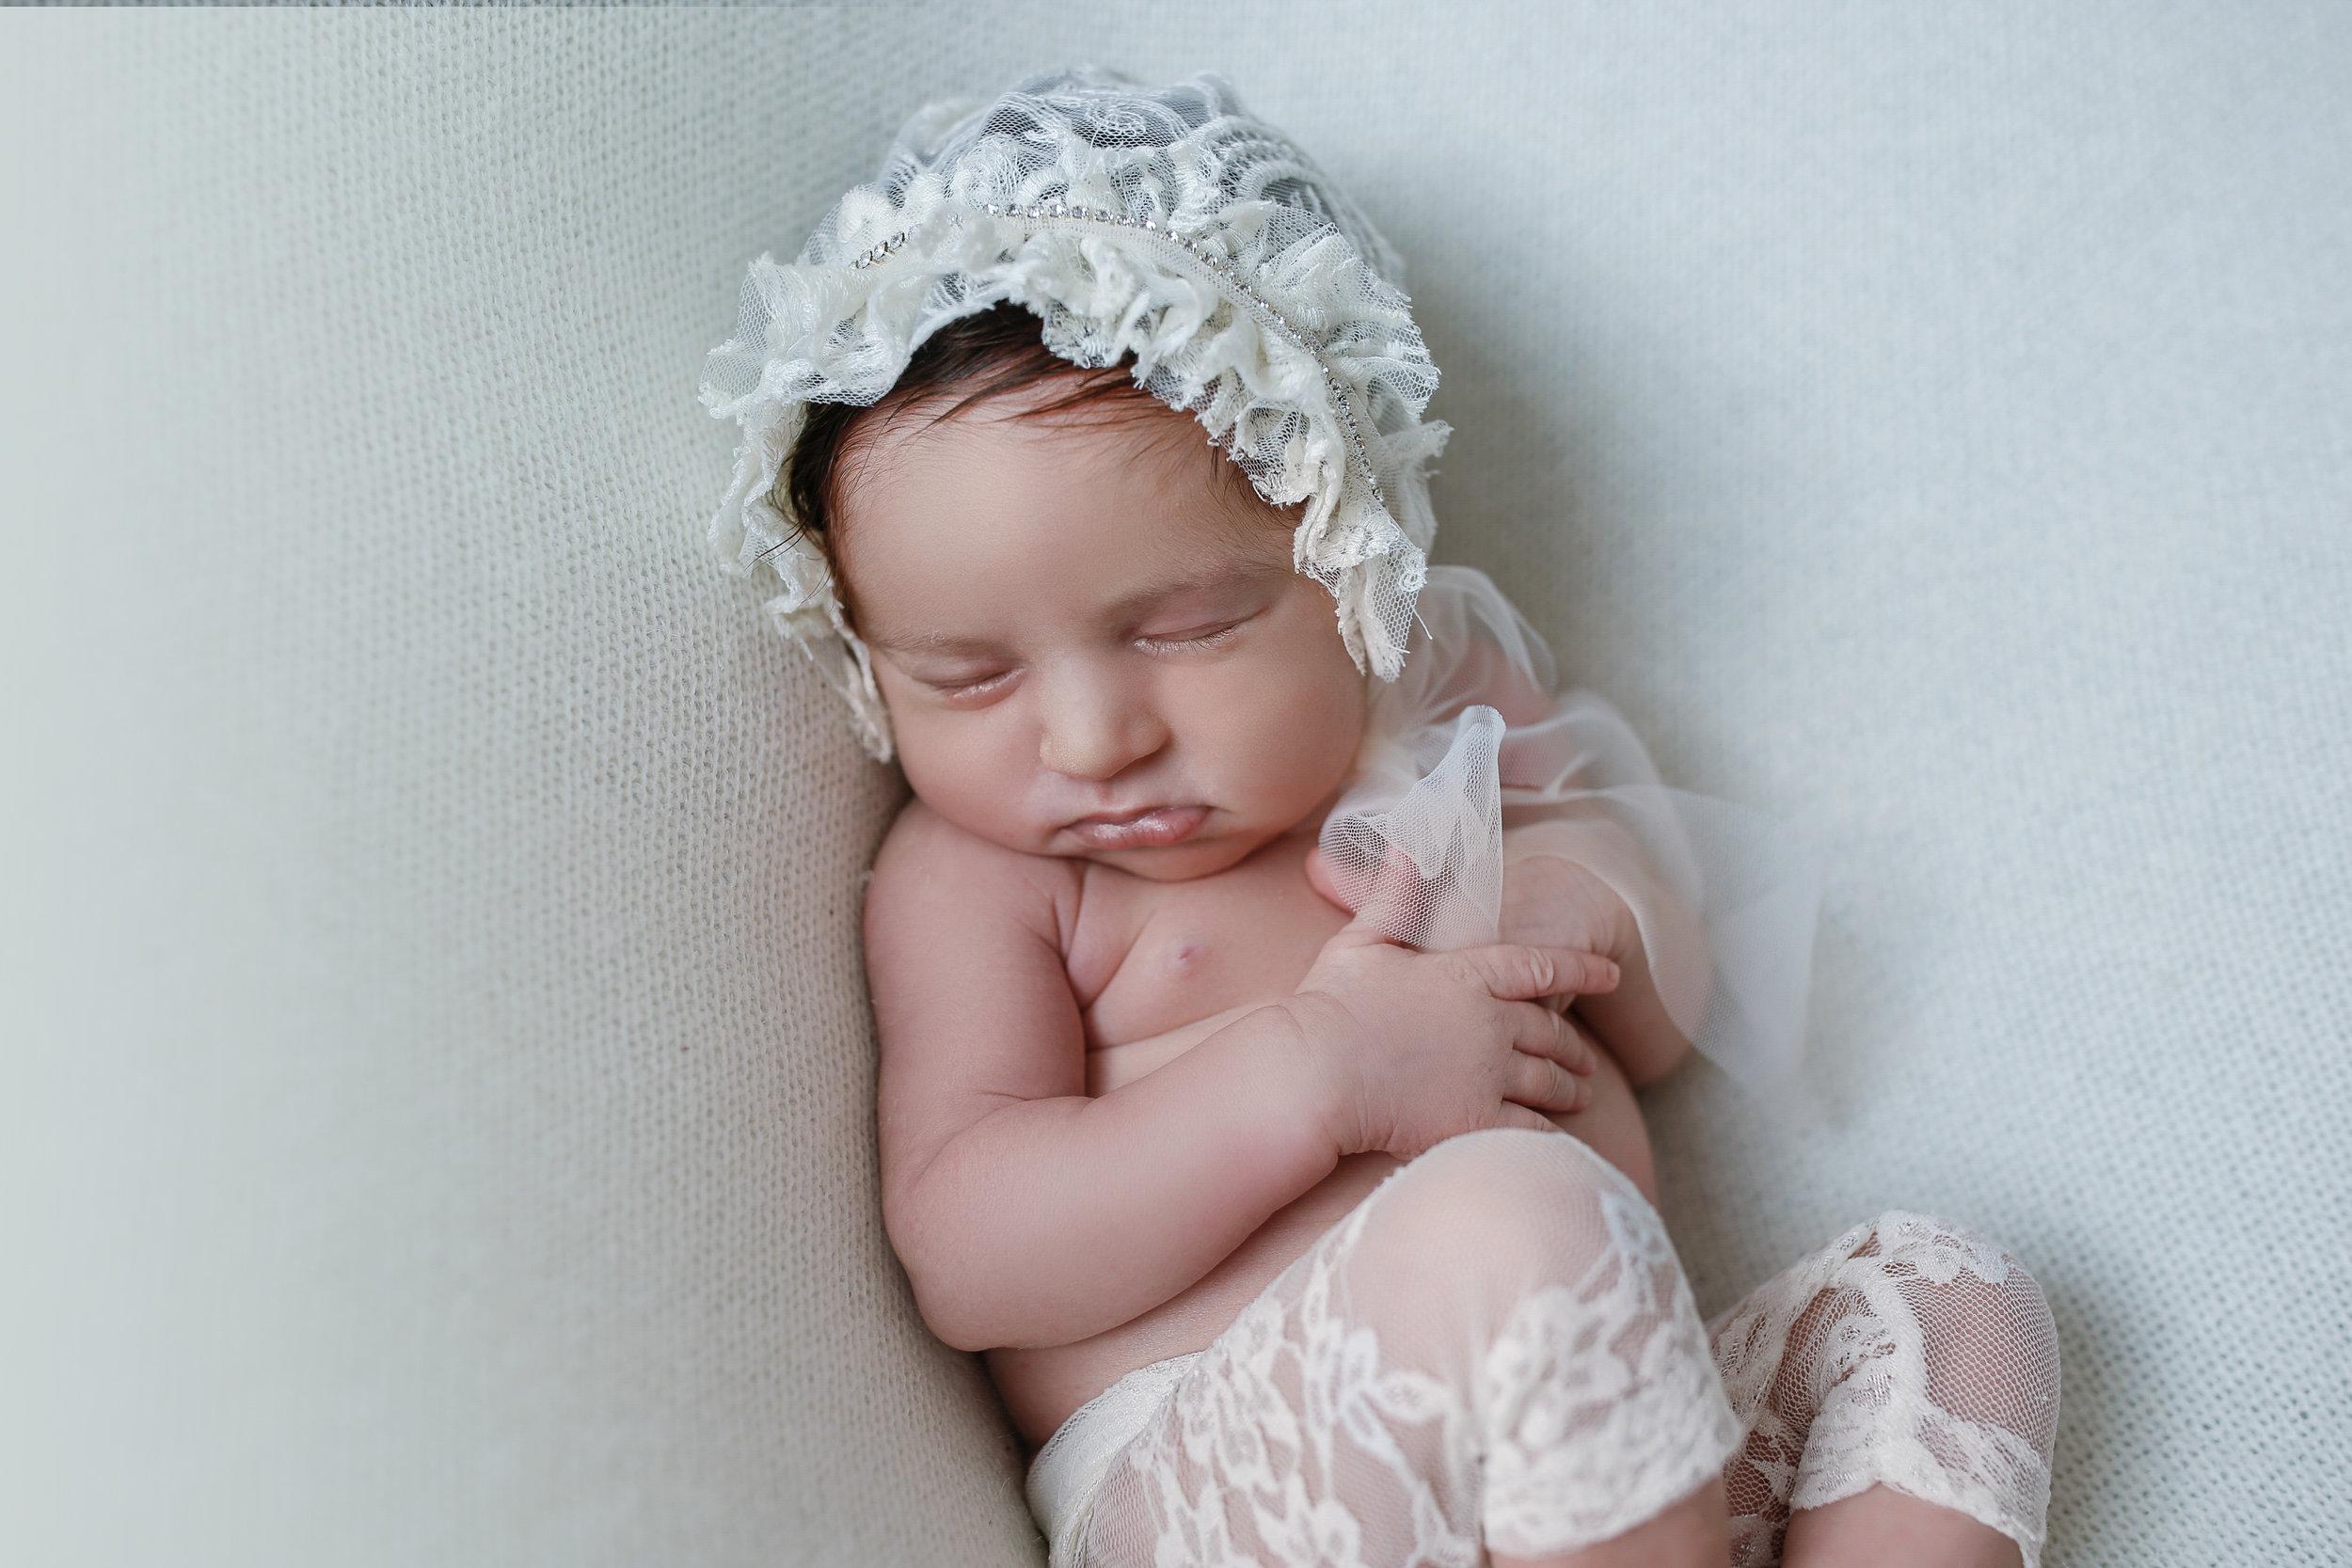 San Francisco Newborn Photographer | Baby Rose | Campbell Kamine Photography -23.jpg